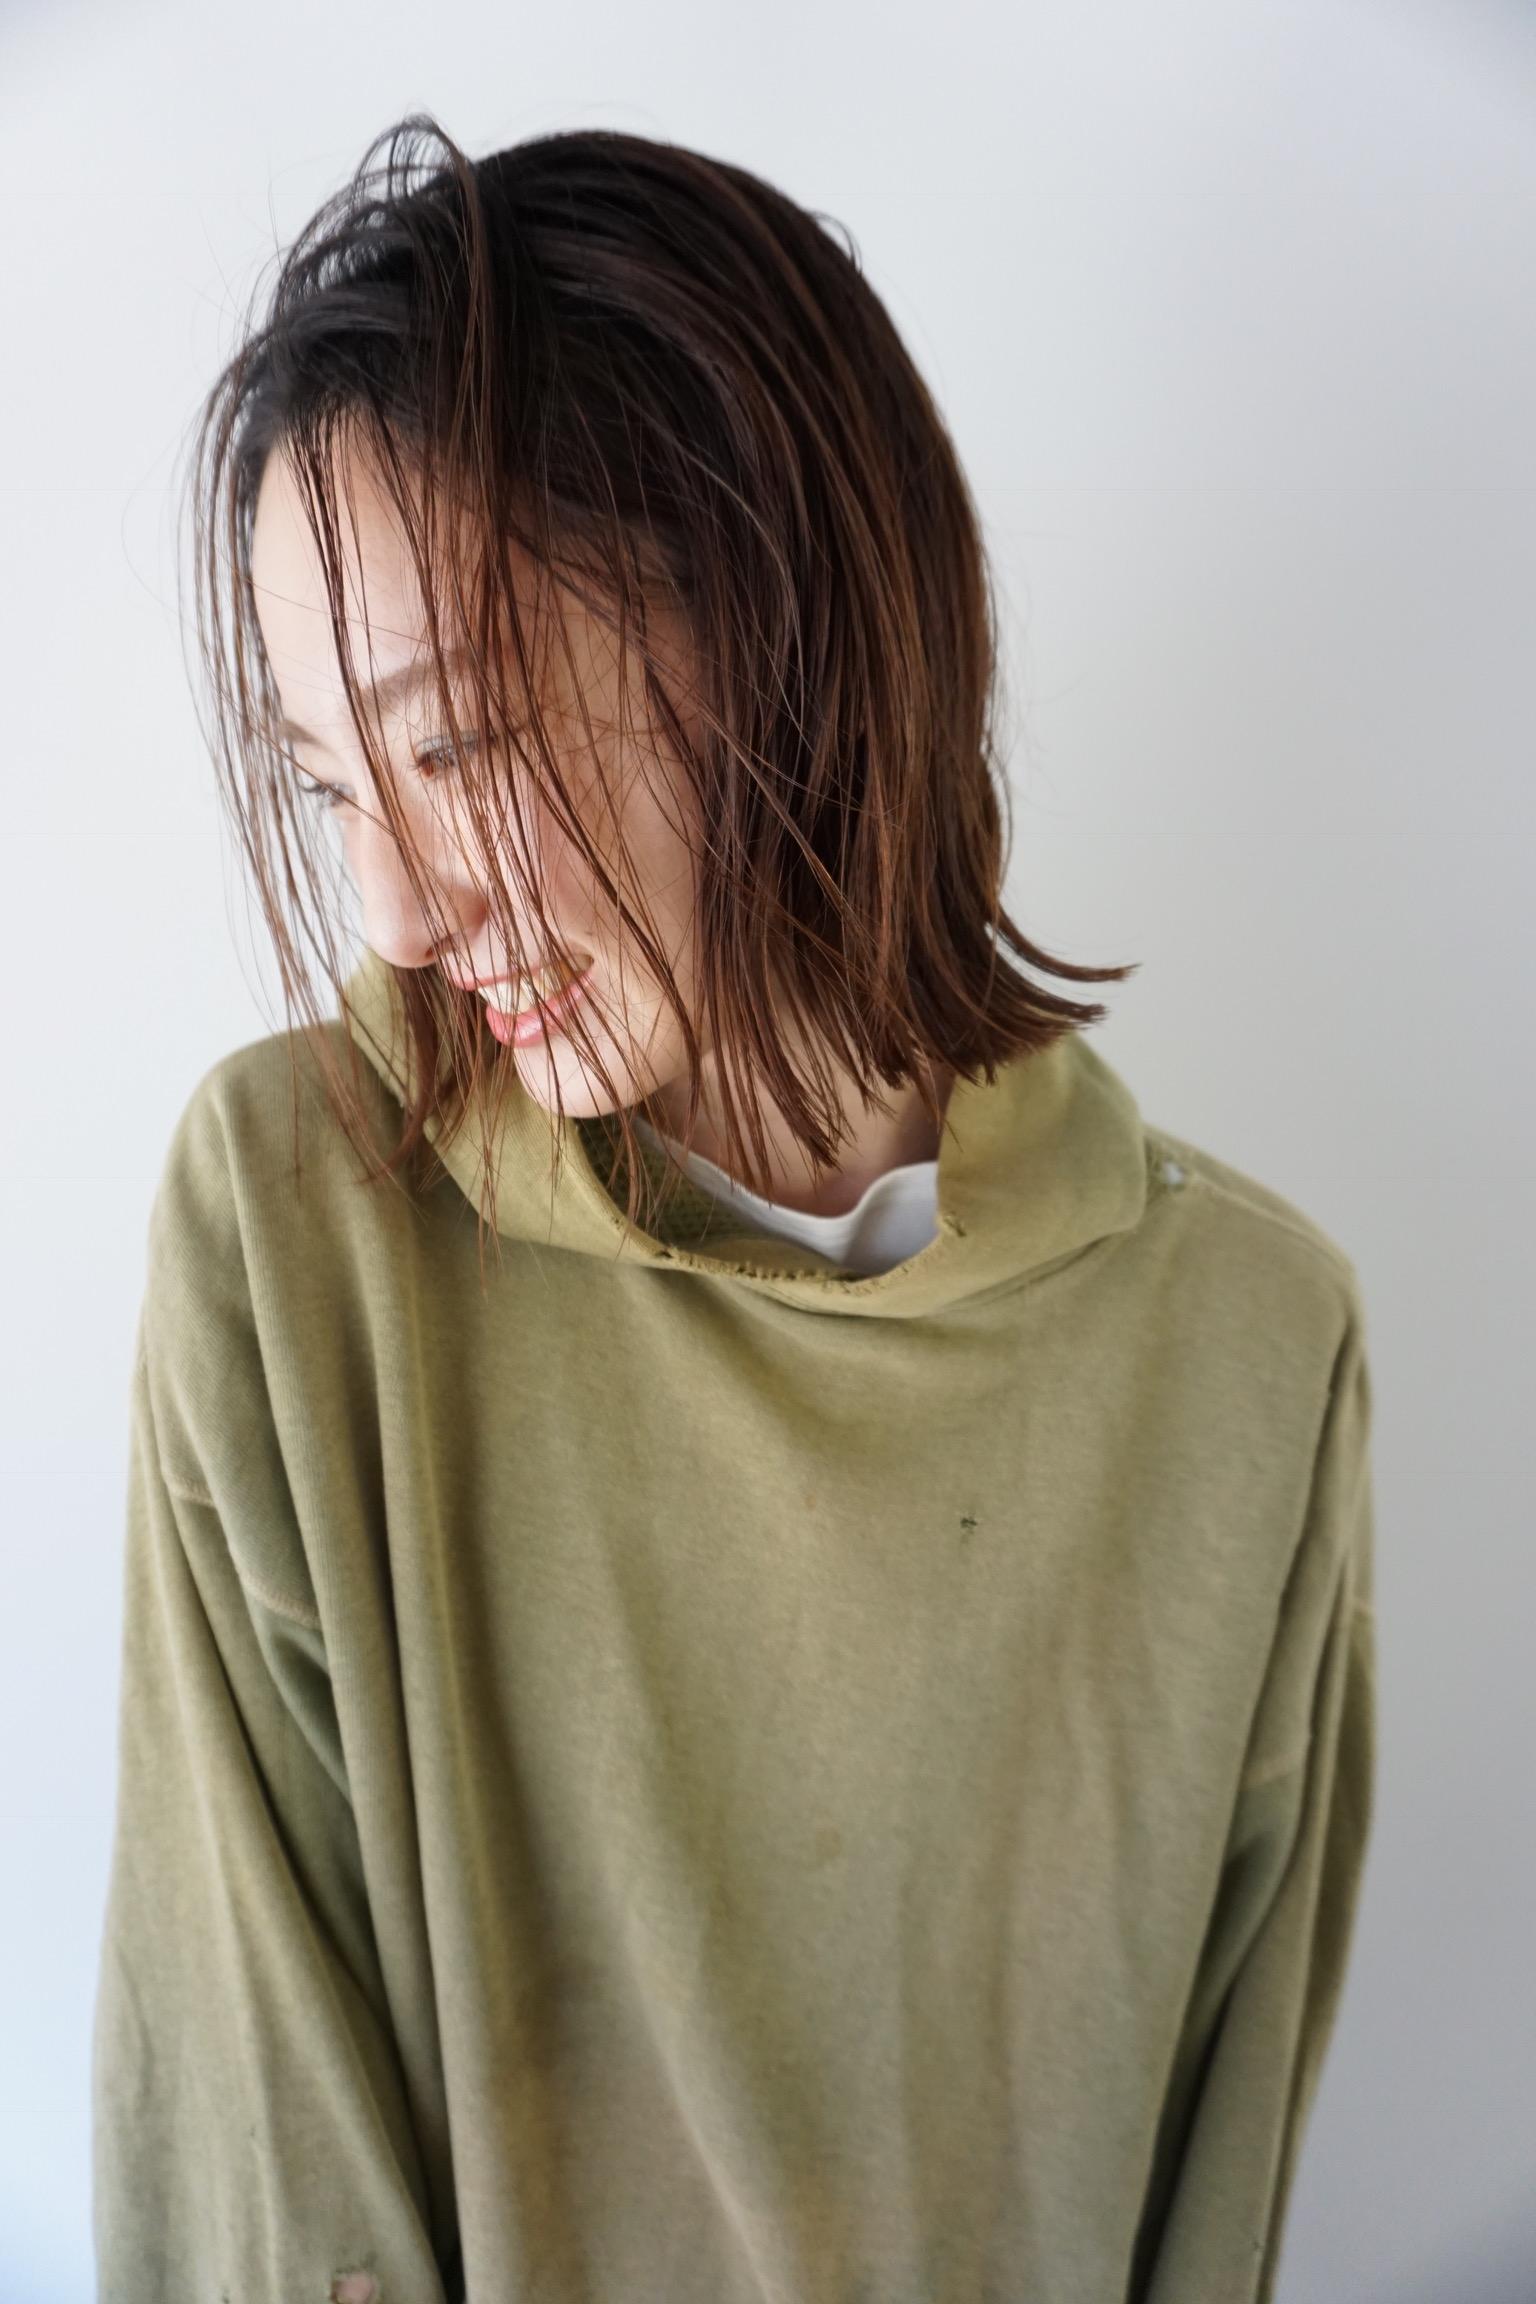 hirobumiya.tokyo